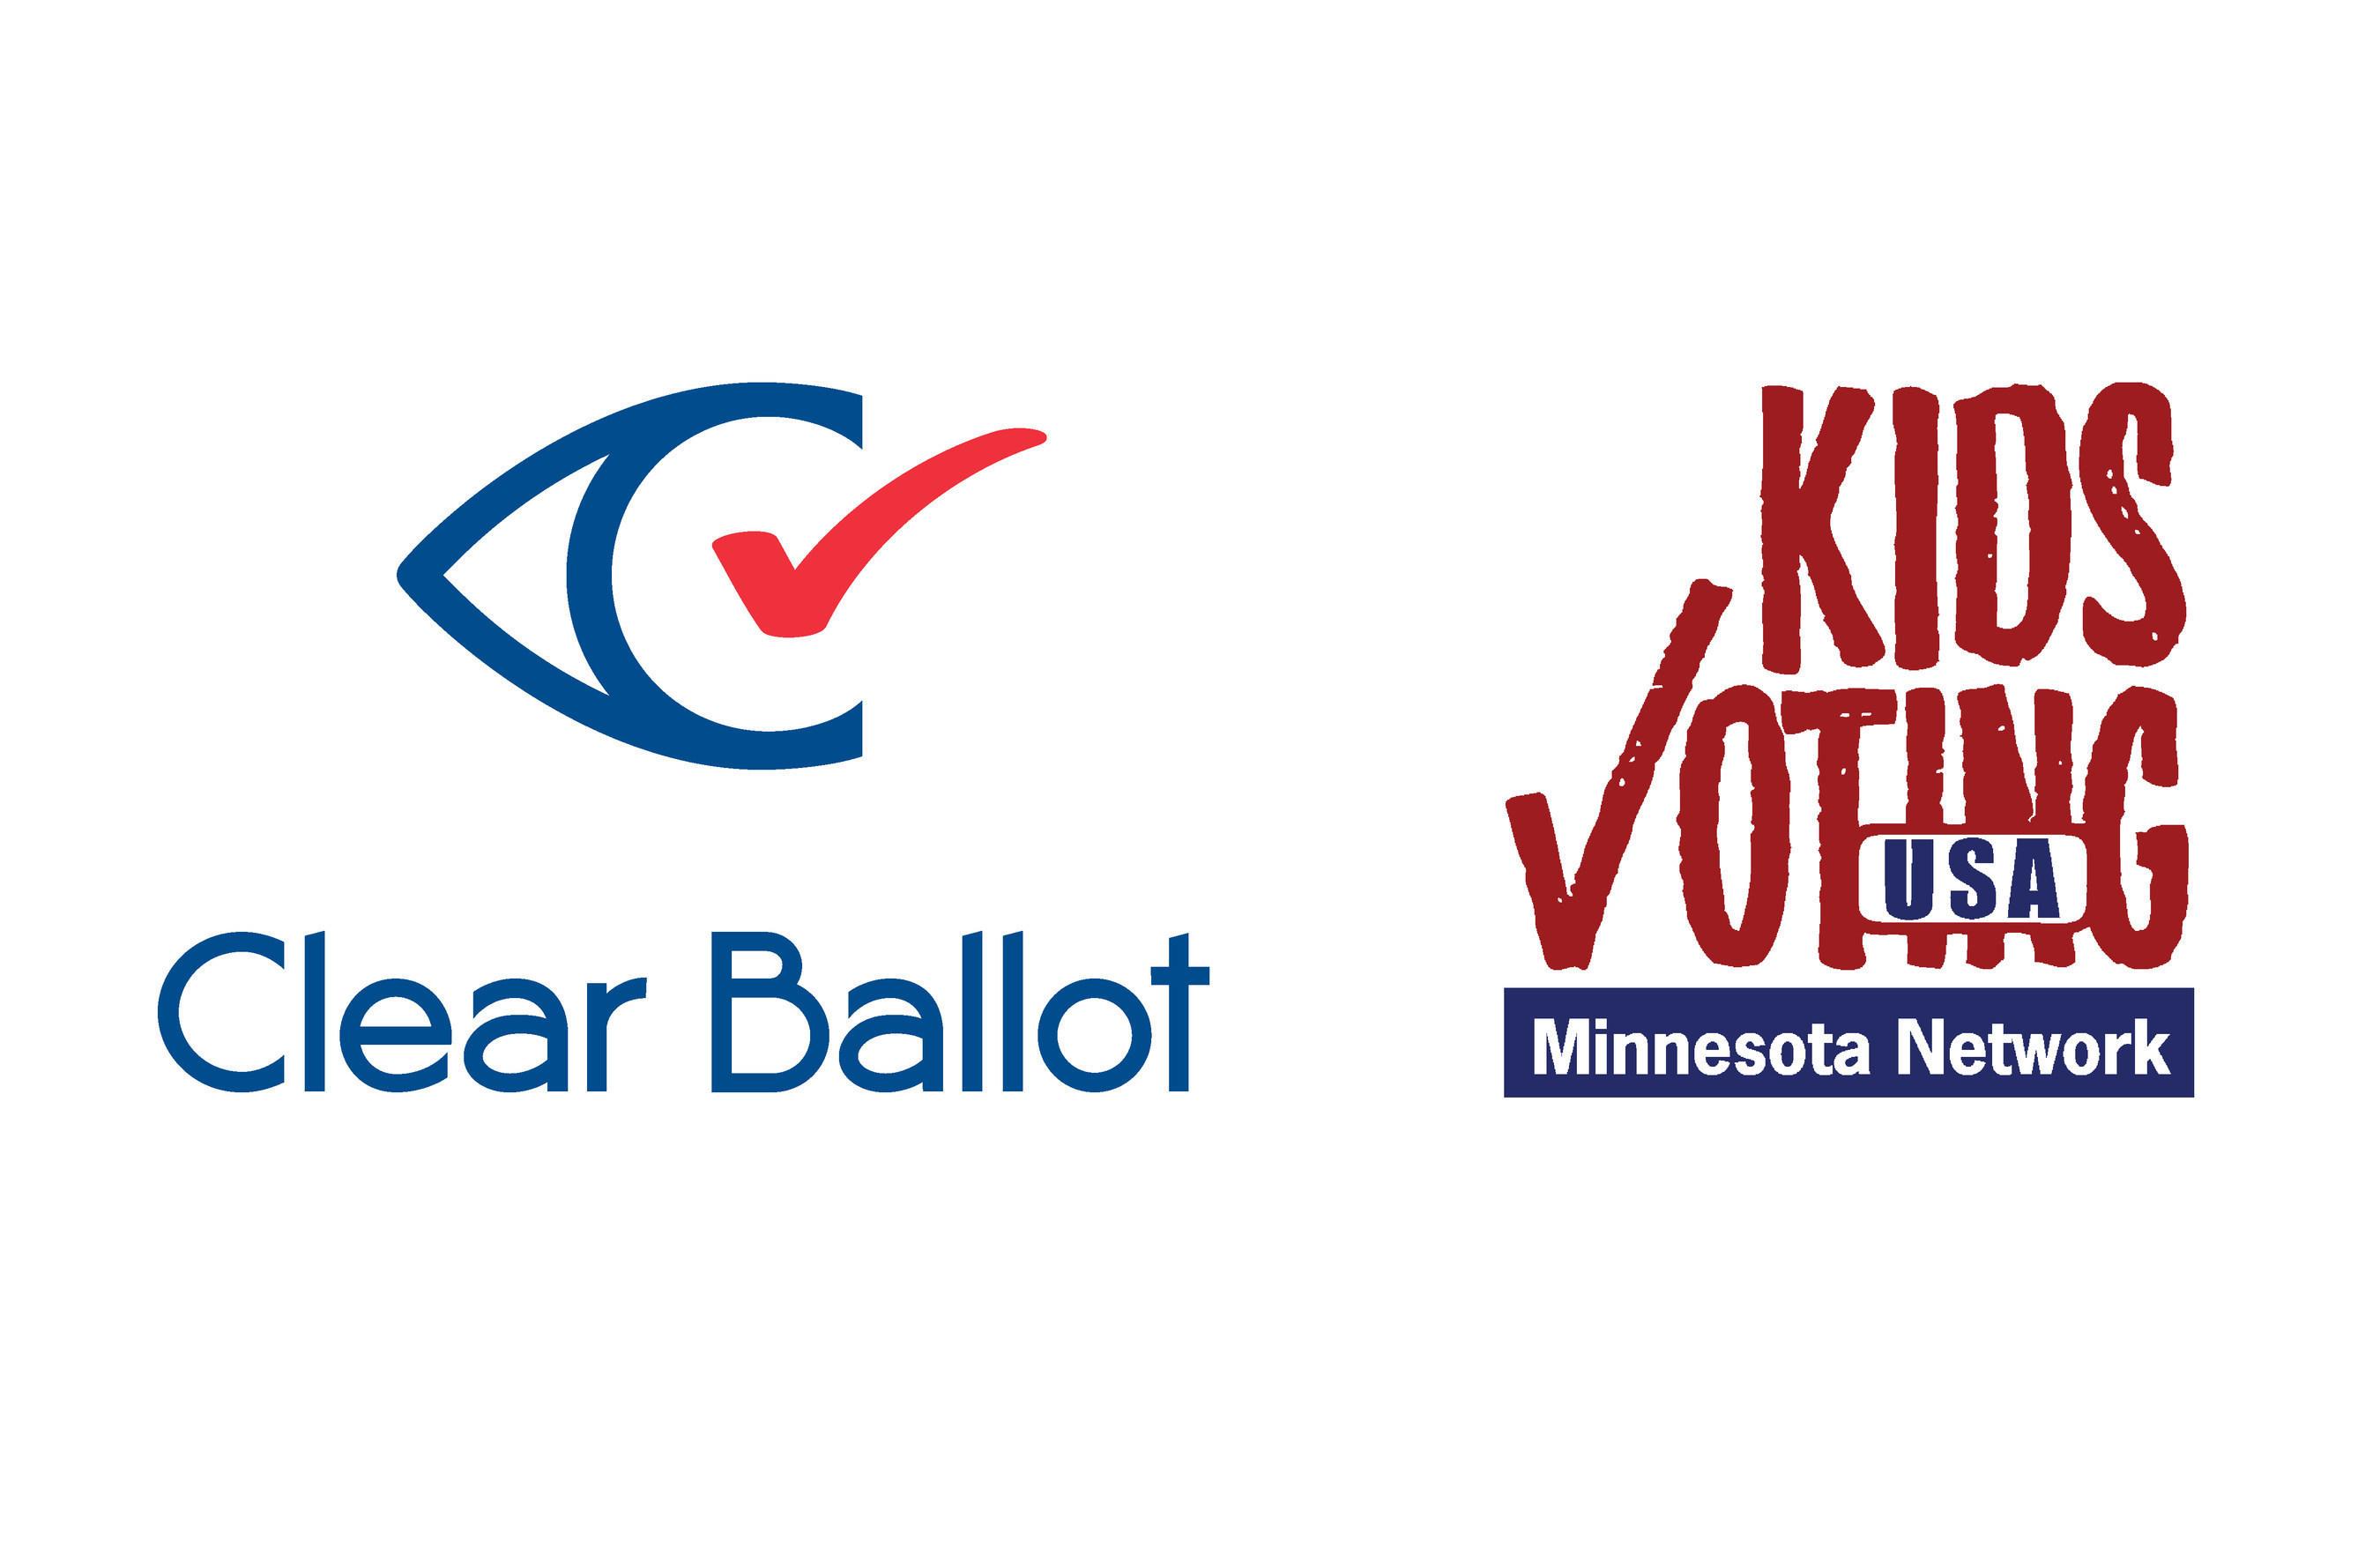 Clear_Ballot_Kids_Voting_Minnesota_Network_Logo